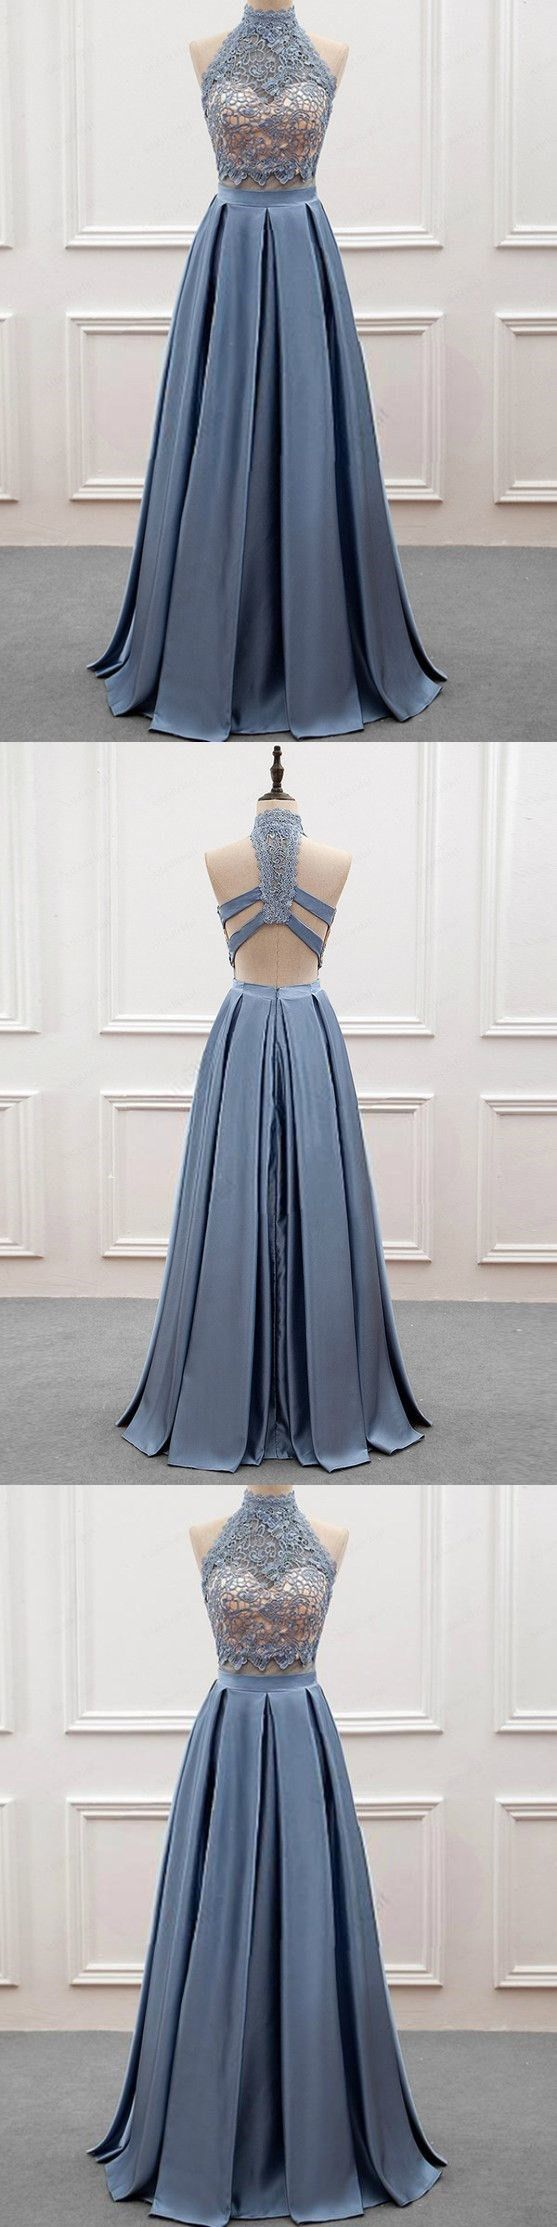 Two piece prom dress simple modest elegant cheap long prom dress